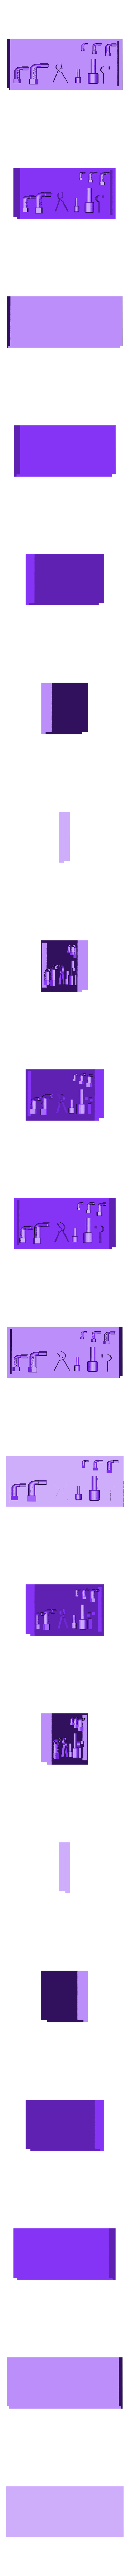 petit plateau.stl Download free STL file FACOM maid 1/10 for garage 1/10 diorama • 3D printing model, RCGANG93